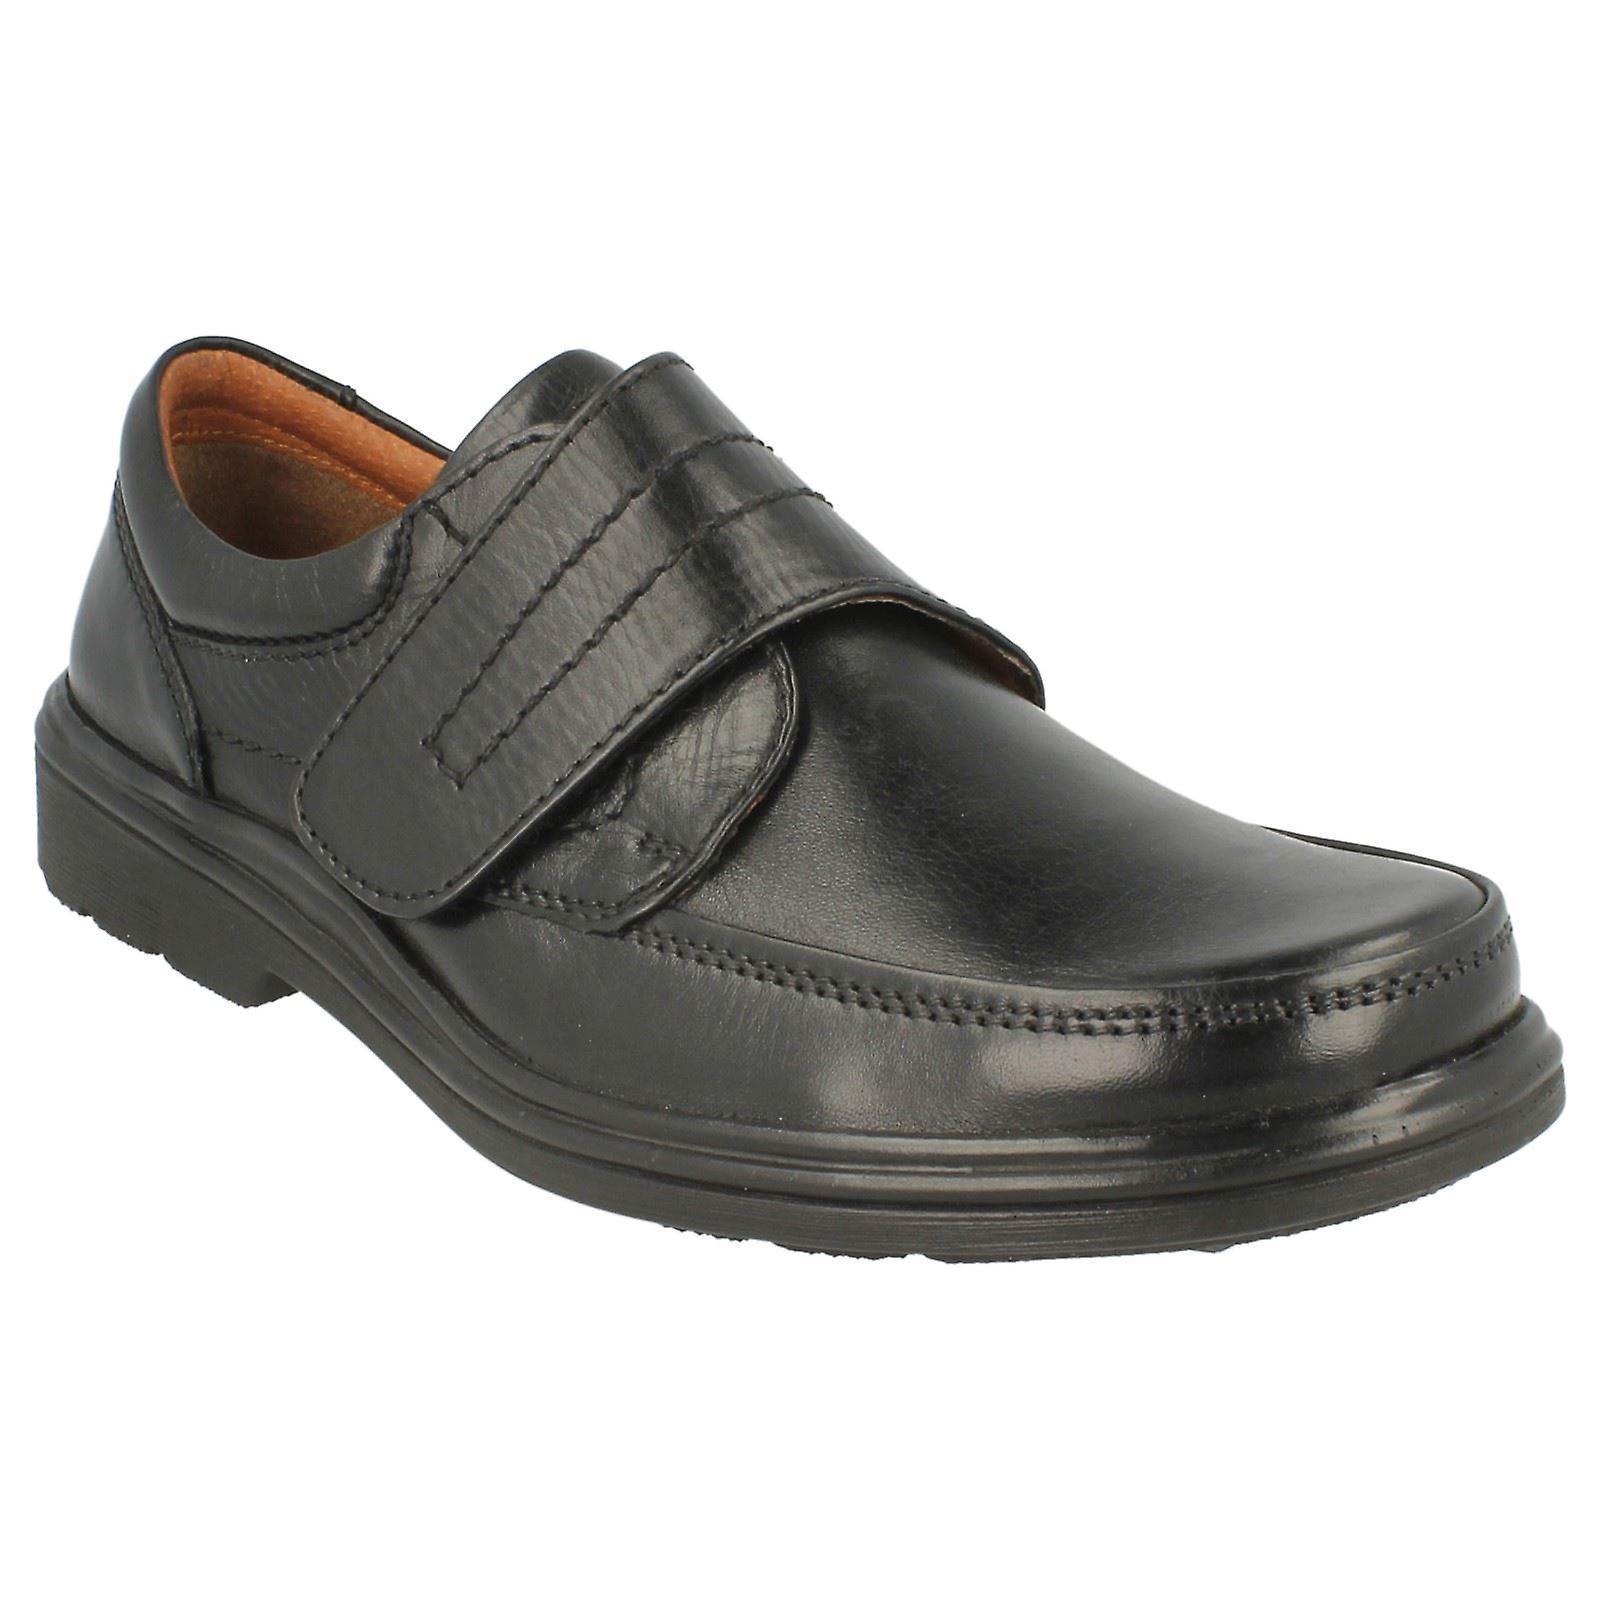 Mens Maverick Shoe Mens Maverick Leather a46a0qw